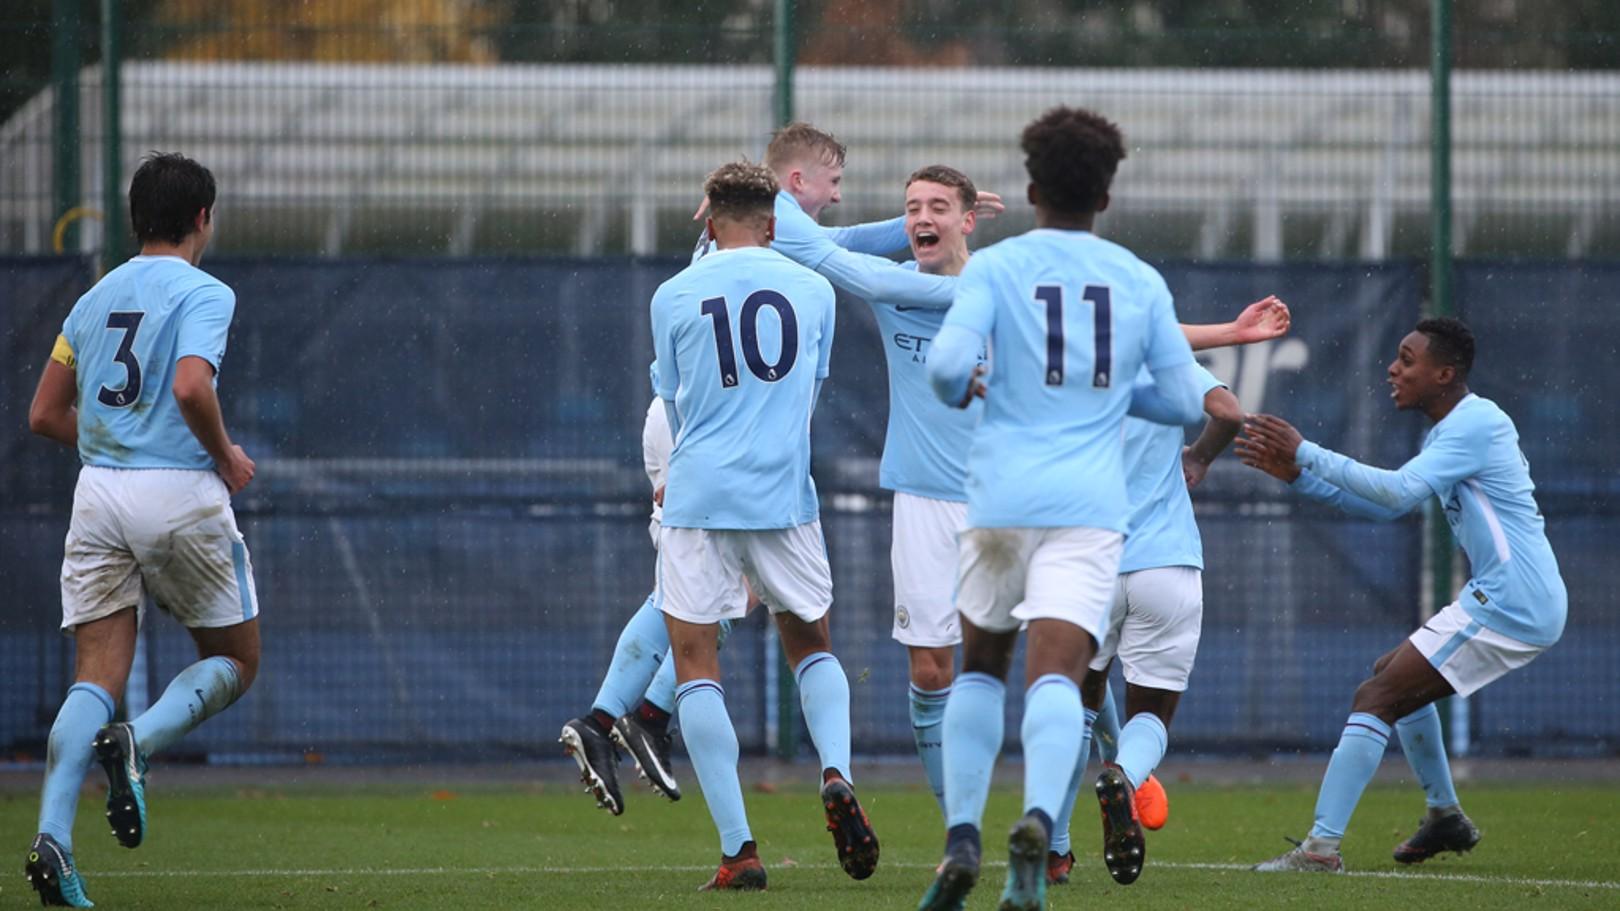 STRIKE: Colin Rosler celebrates scoring against Manchester United U18s.